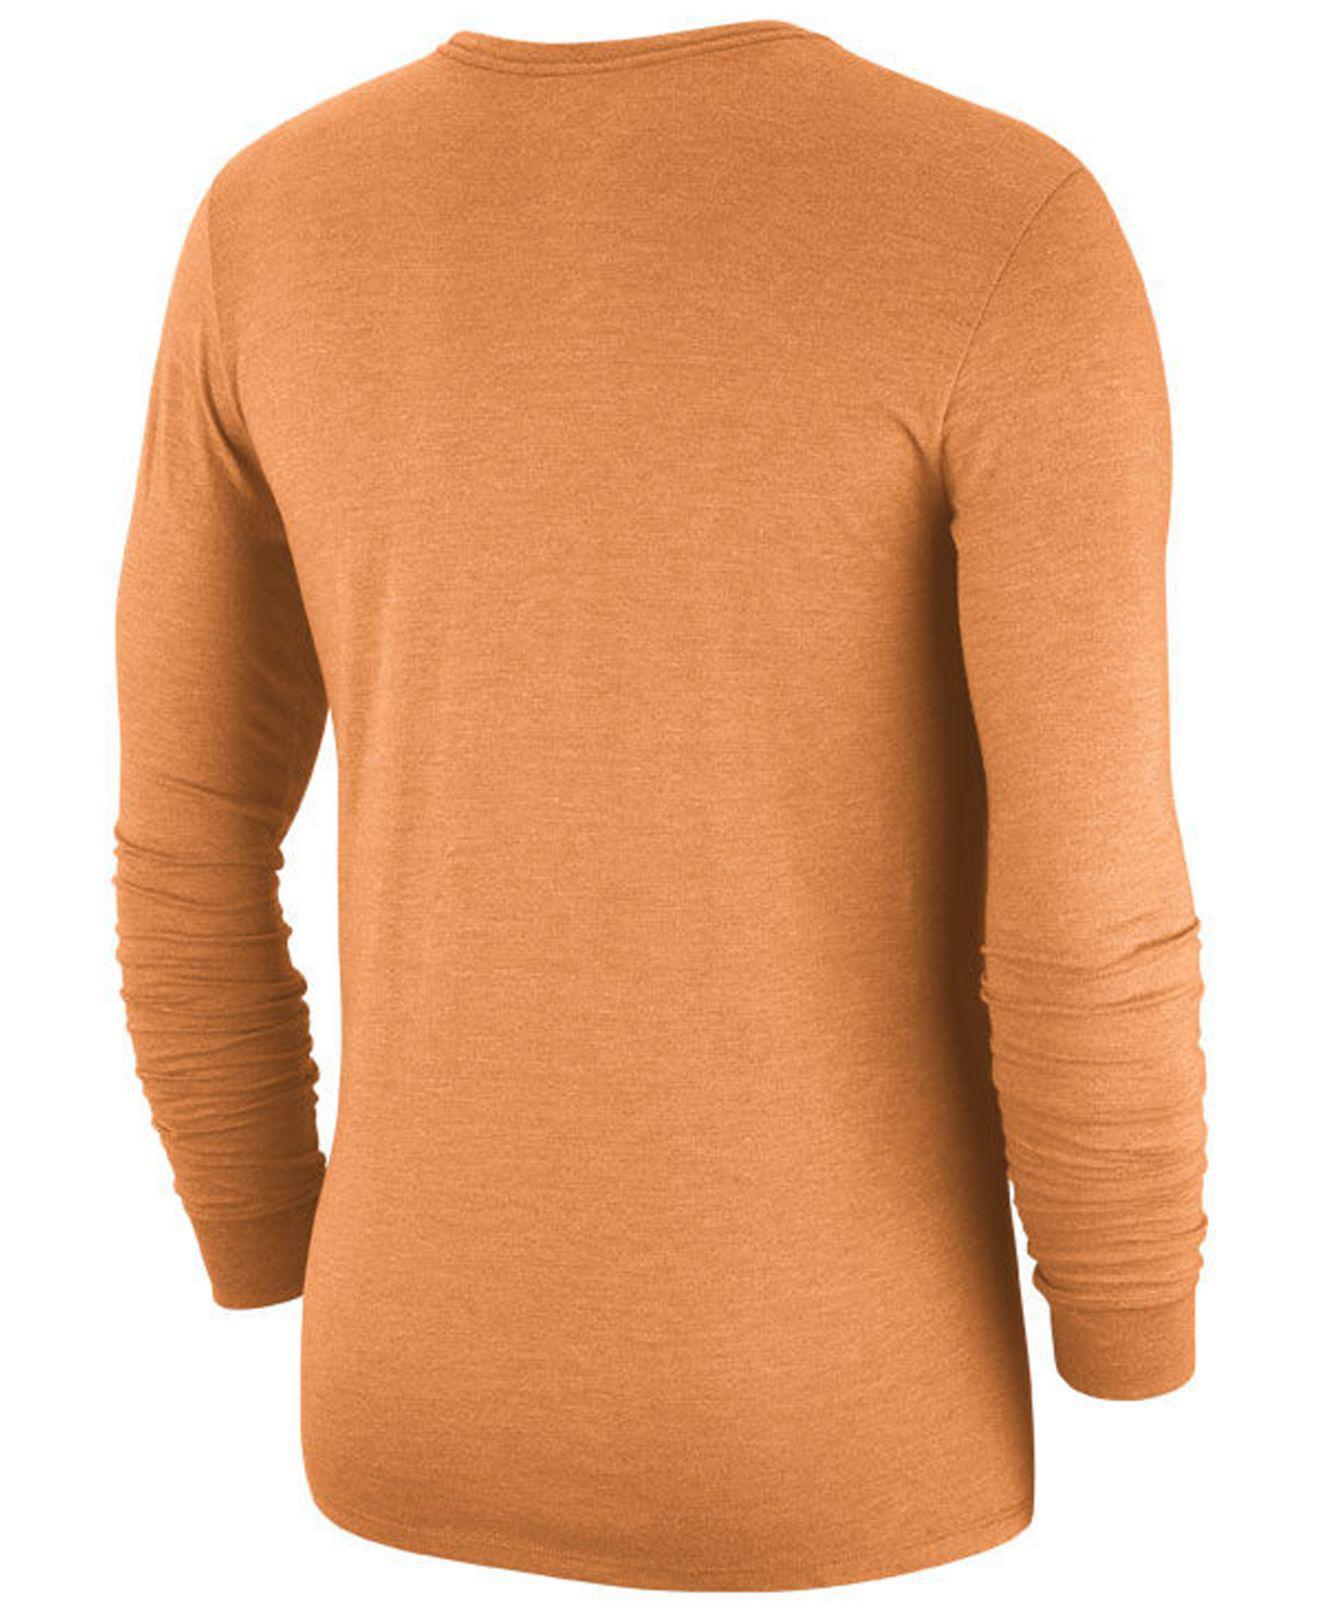 Lyst - Nike (nfl Buccaneers) Men s Tri-blend Long Sleeve T-shirt in Orange  for Men - Save 25.0% 5cf9f317e